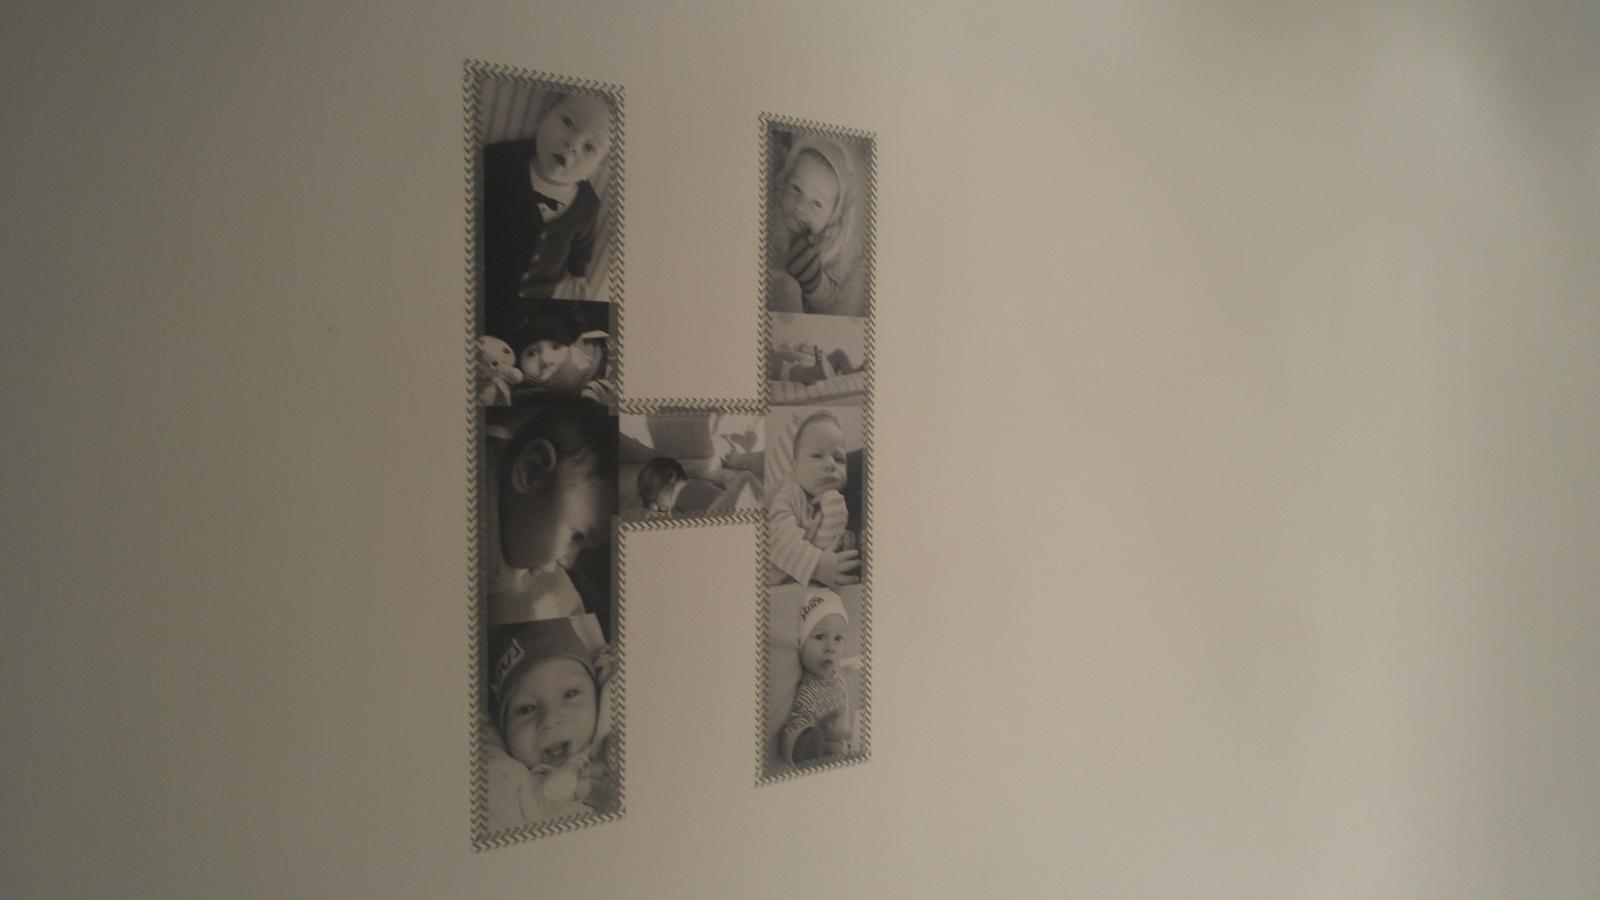 D☼m@ - nasledne washi paskami som pismena prilepila na stenu, zatial H-otove :-)